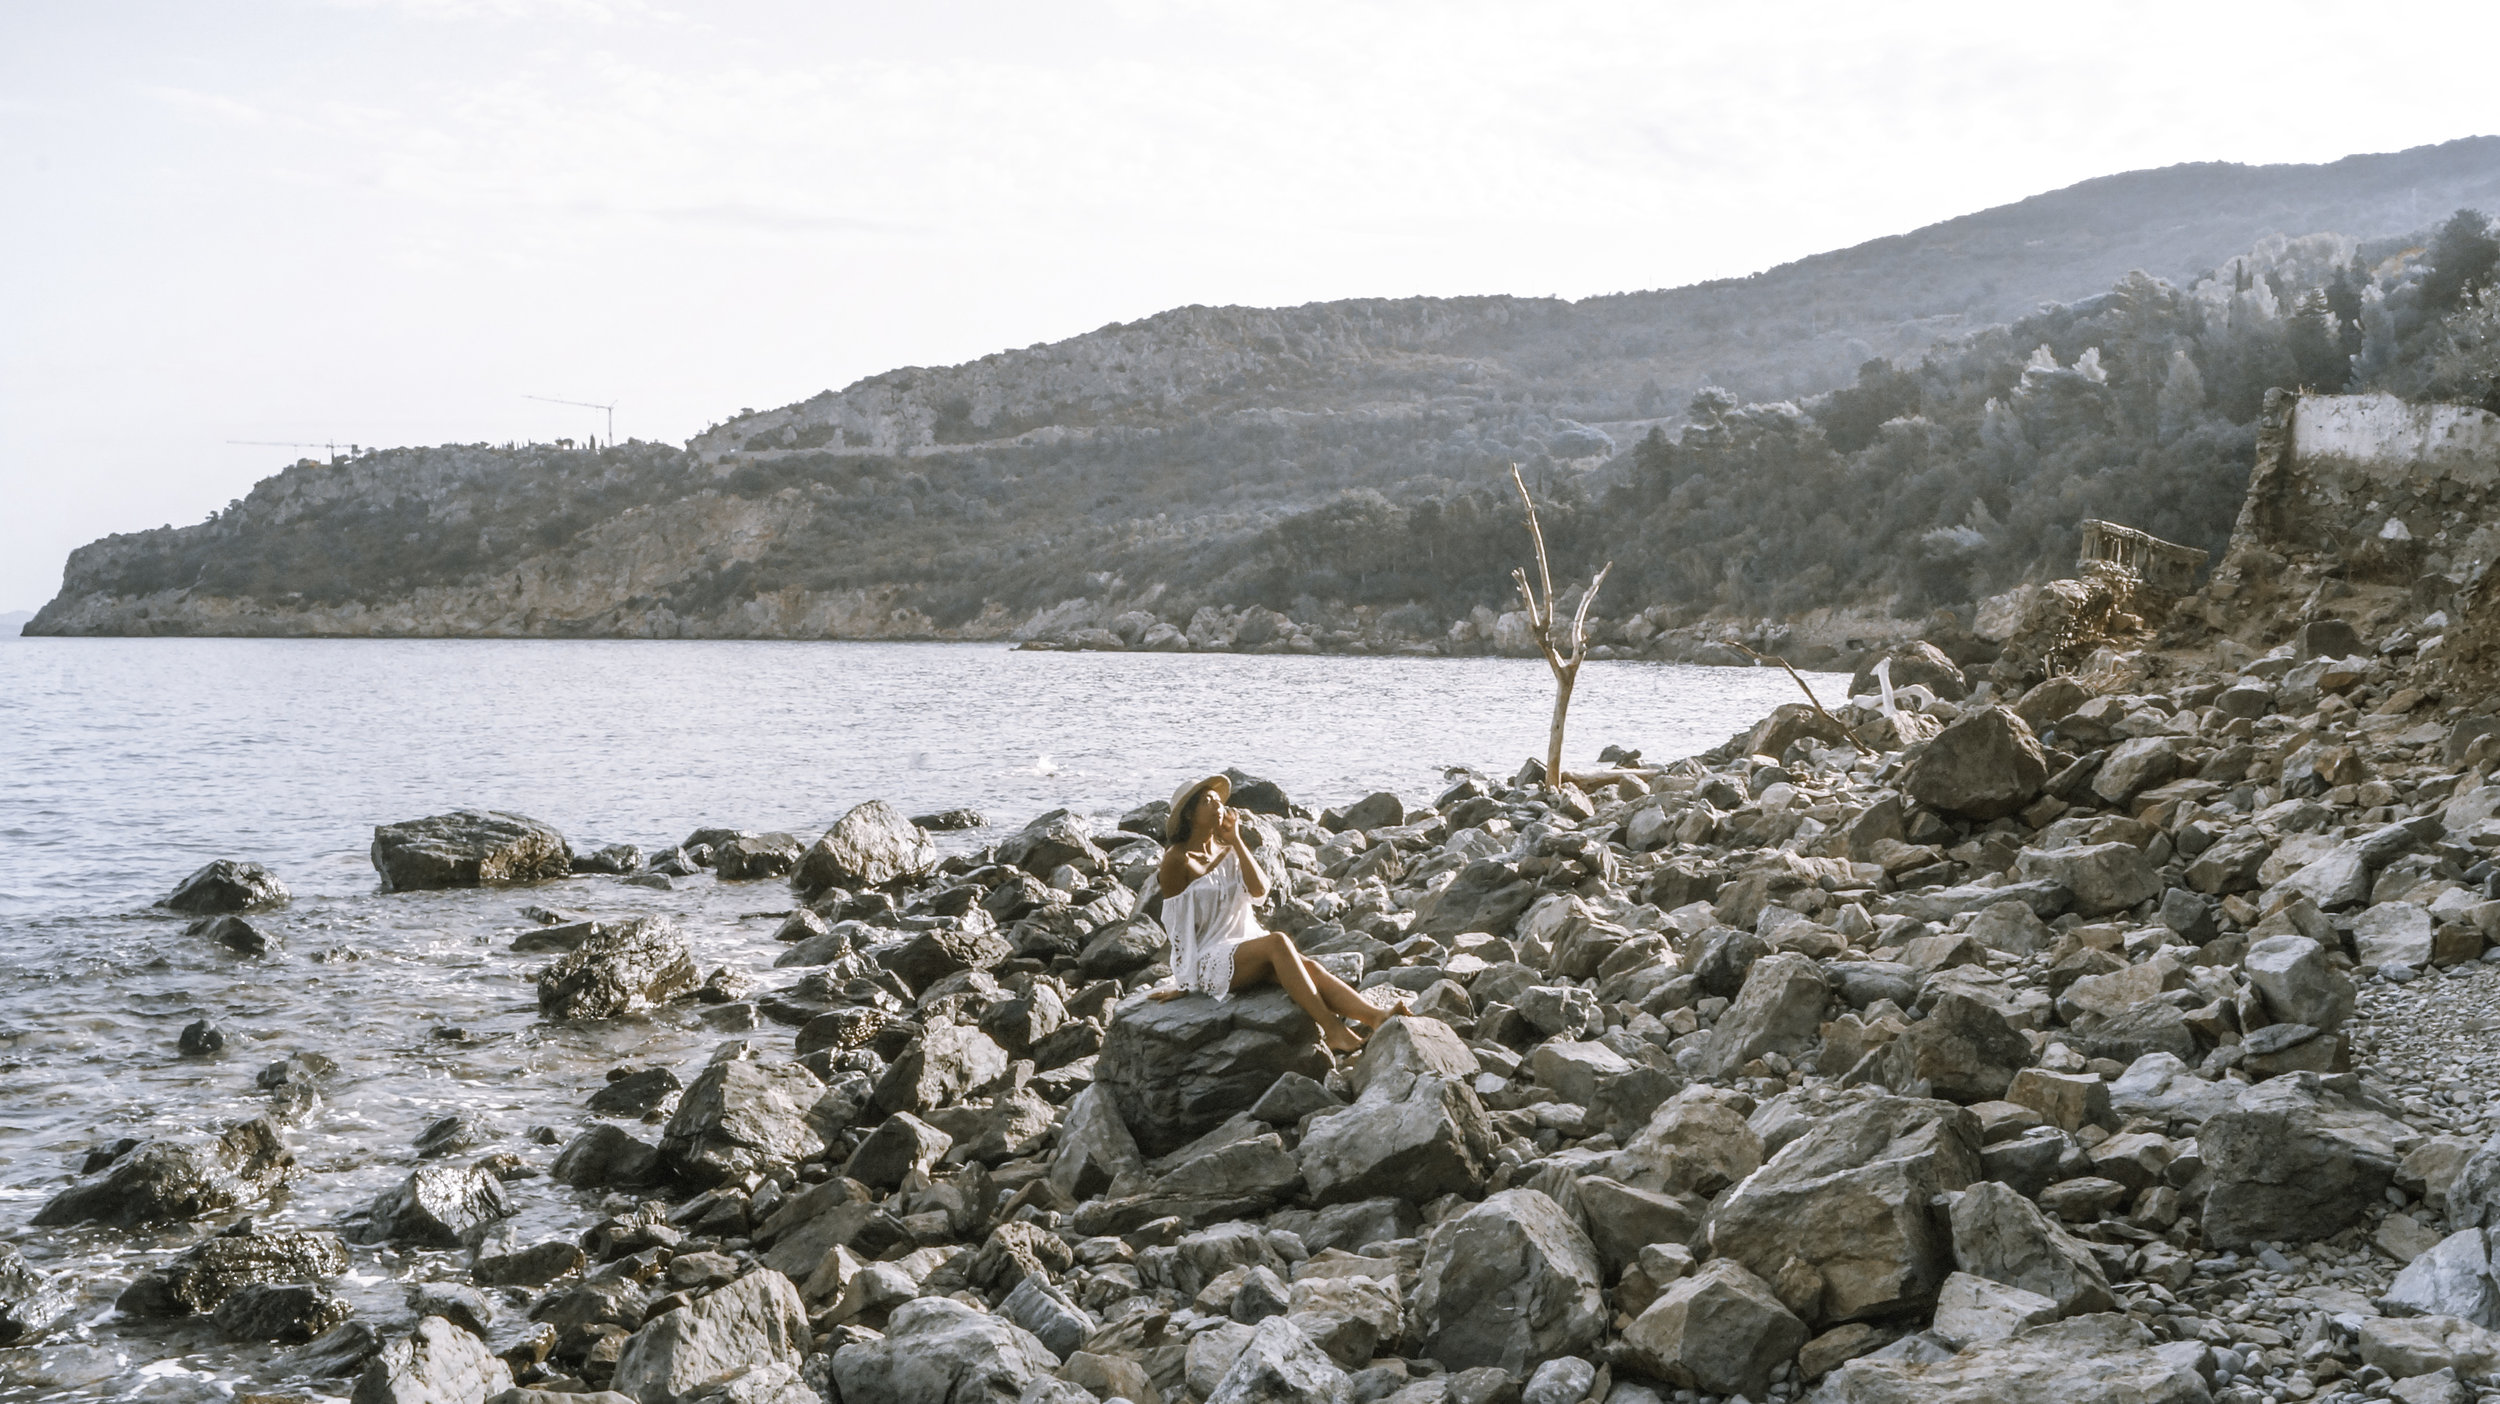 Monte Argentario, Tuscany Coast - Beach Vibes 12 - CocoBay x illumelation.jpg